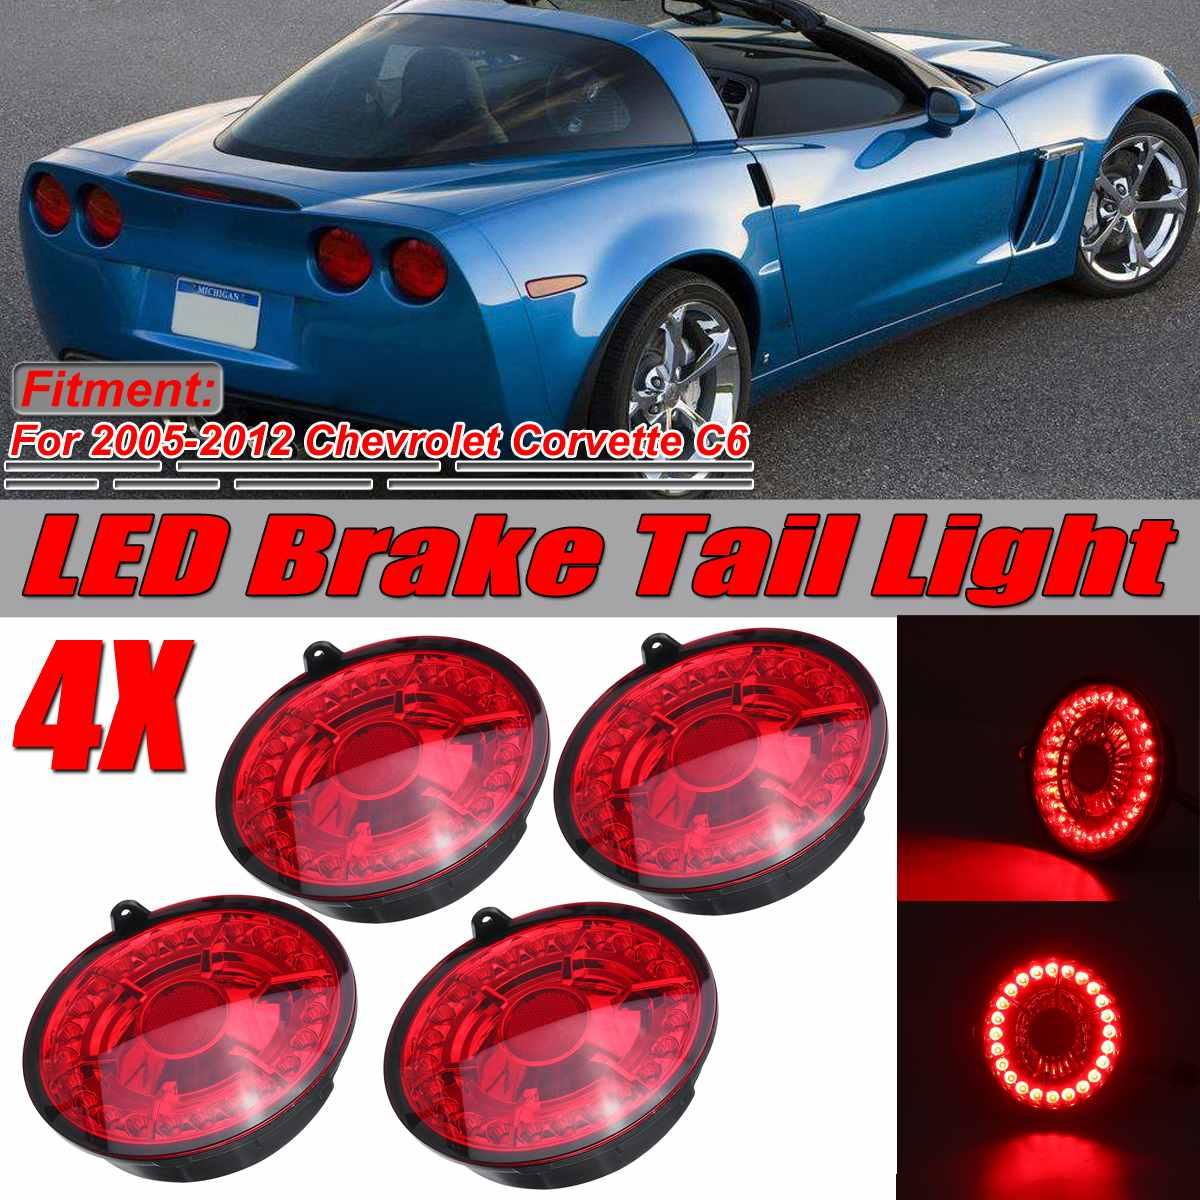 Nuevo C6 coche luces traseras LED para luz de freno Luz de LED de freno Luz de cola para Chevrolet Corvette para C6 para Coupe 2005-2013